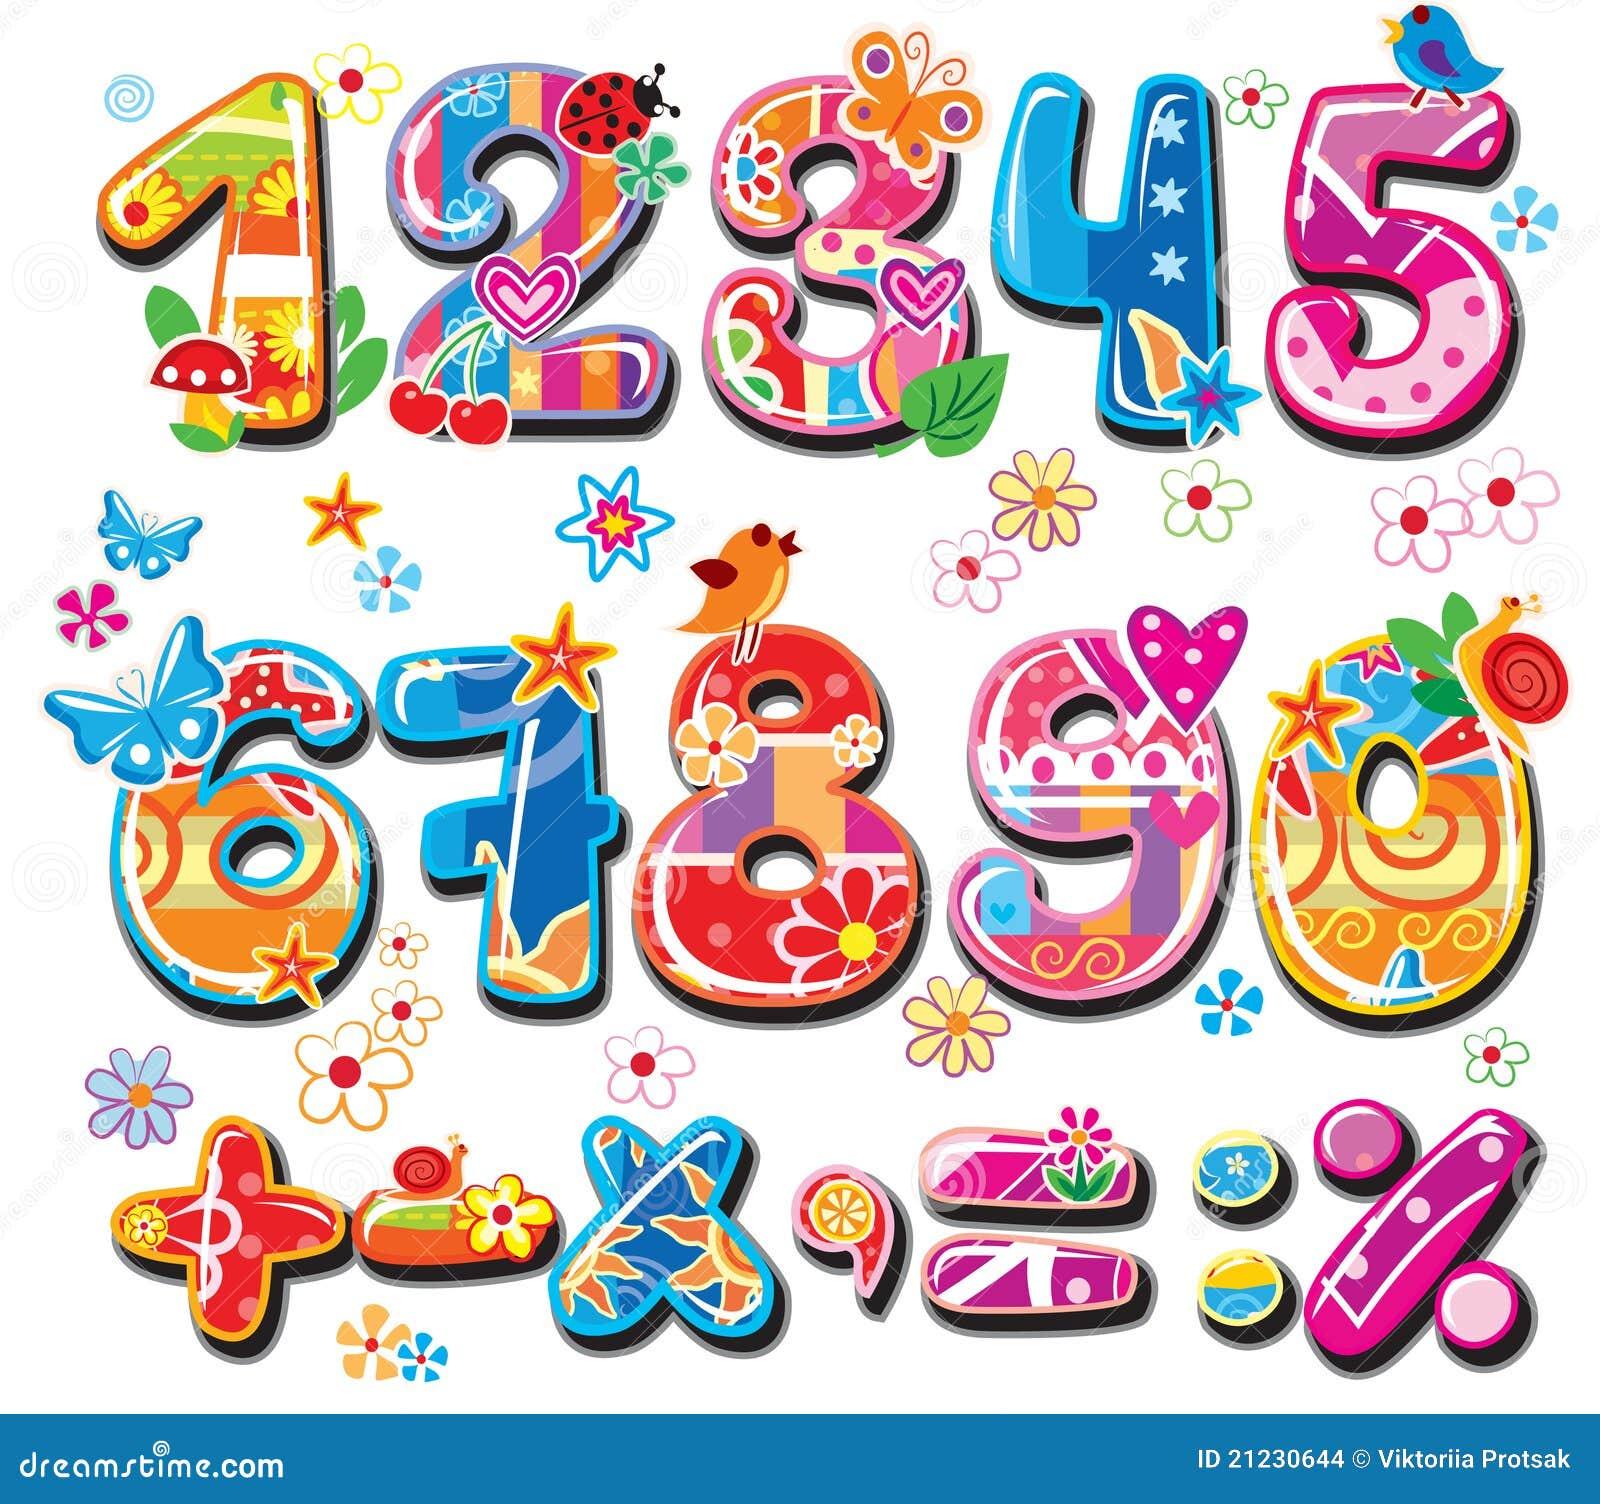 Eccezionale Matematica Divertente Per Bambini JG79 » Regardsdefemmes HN02